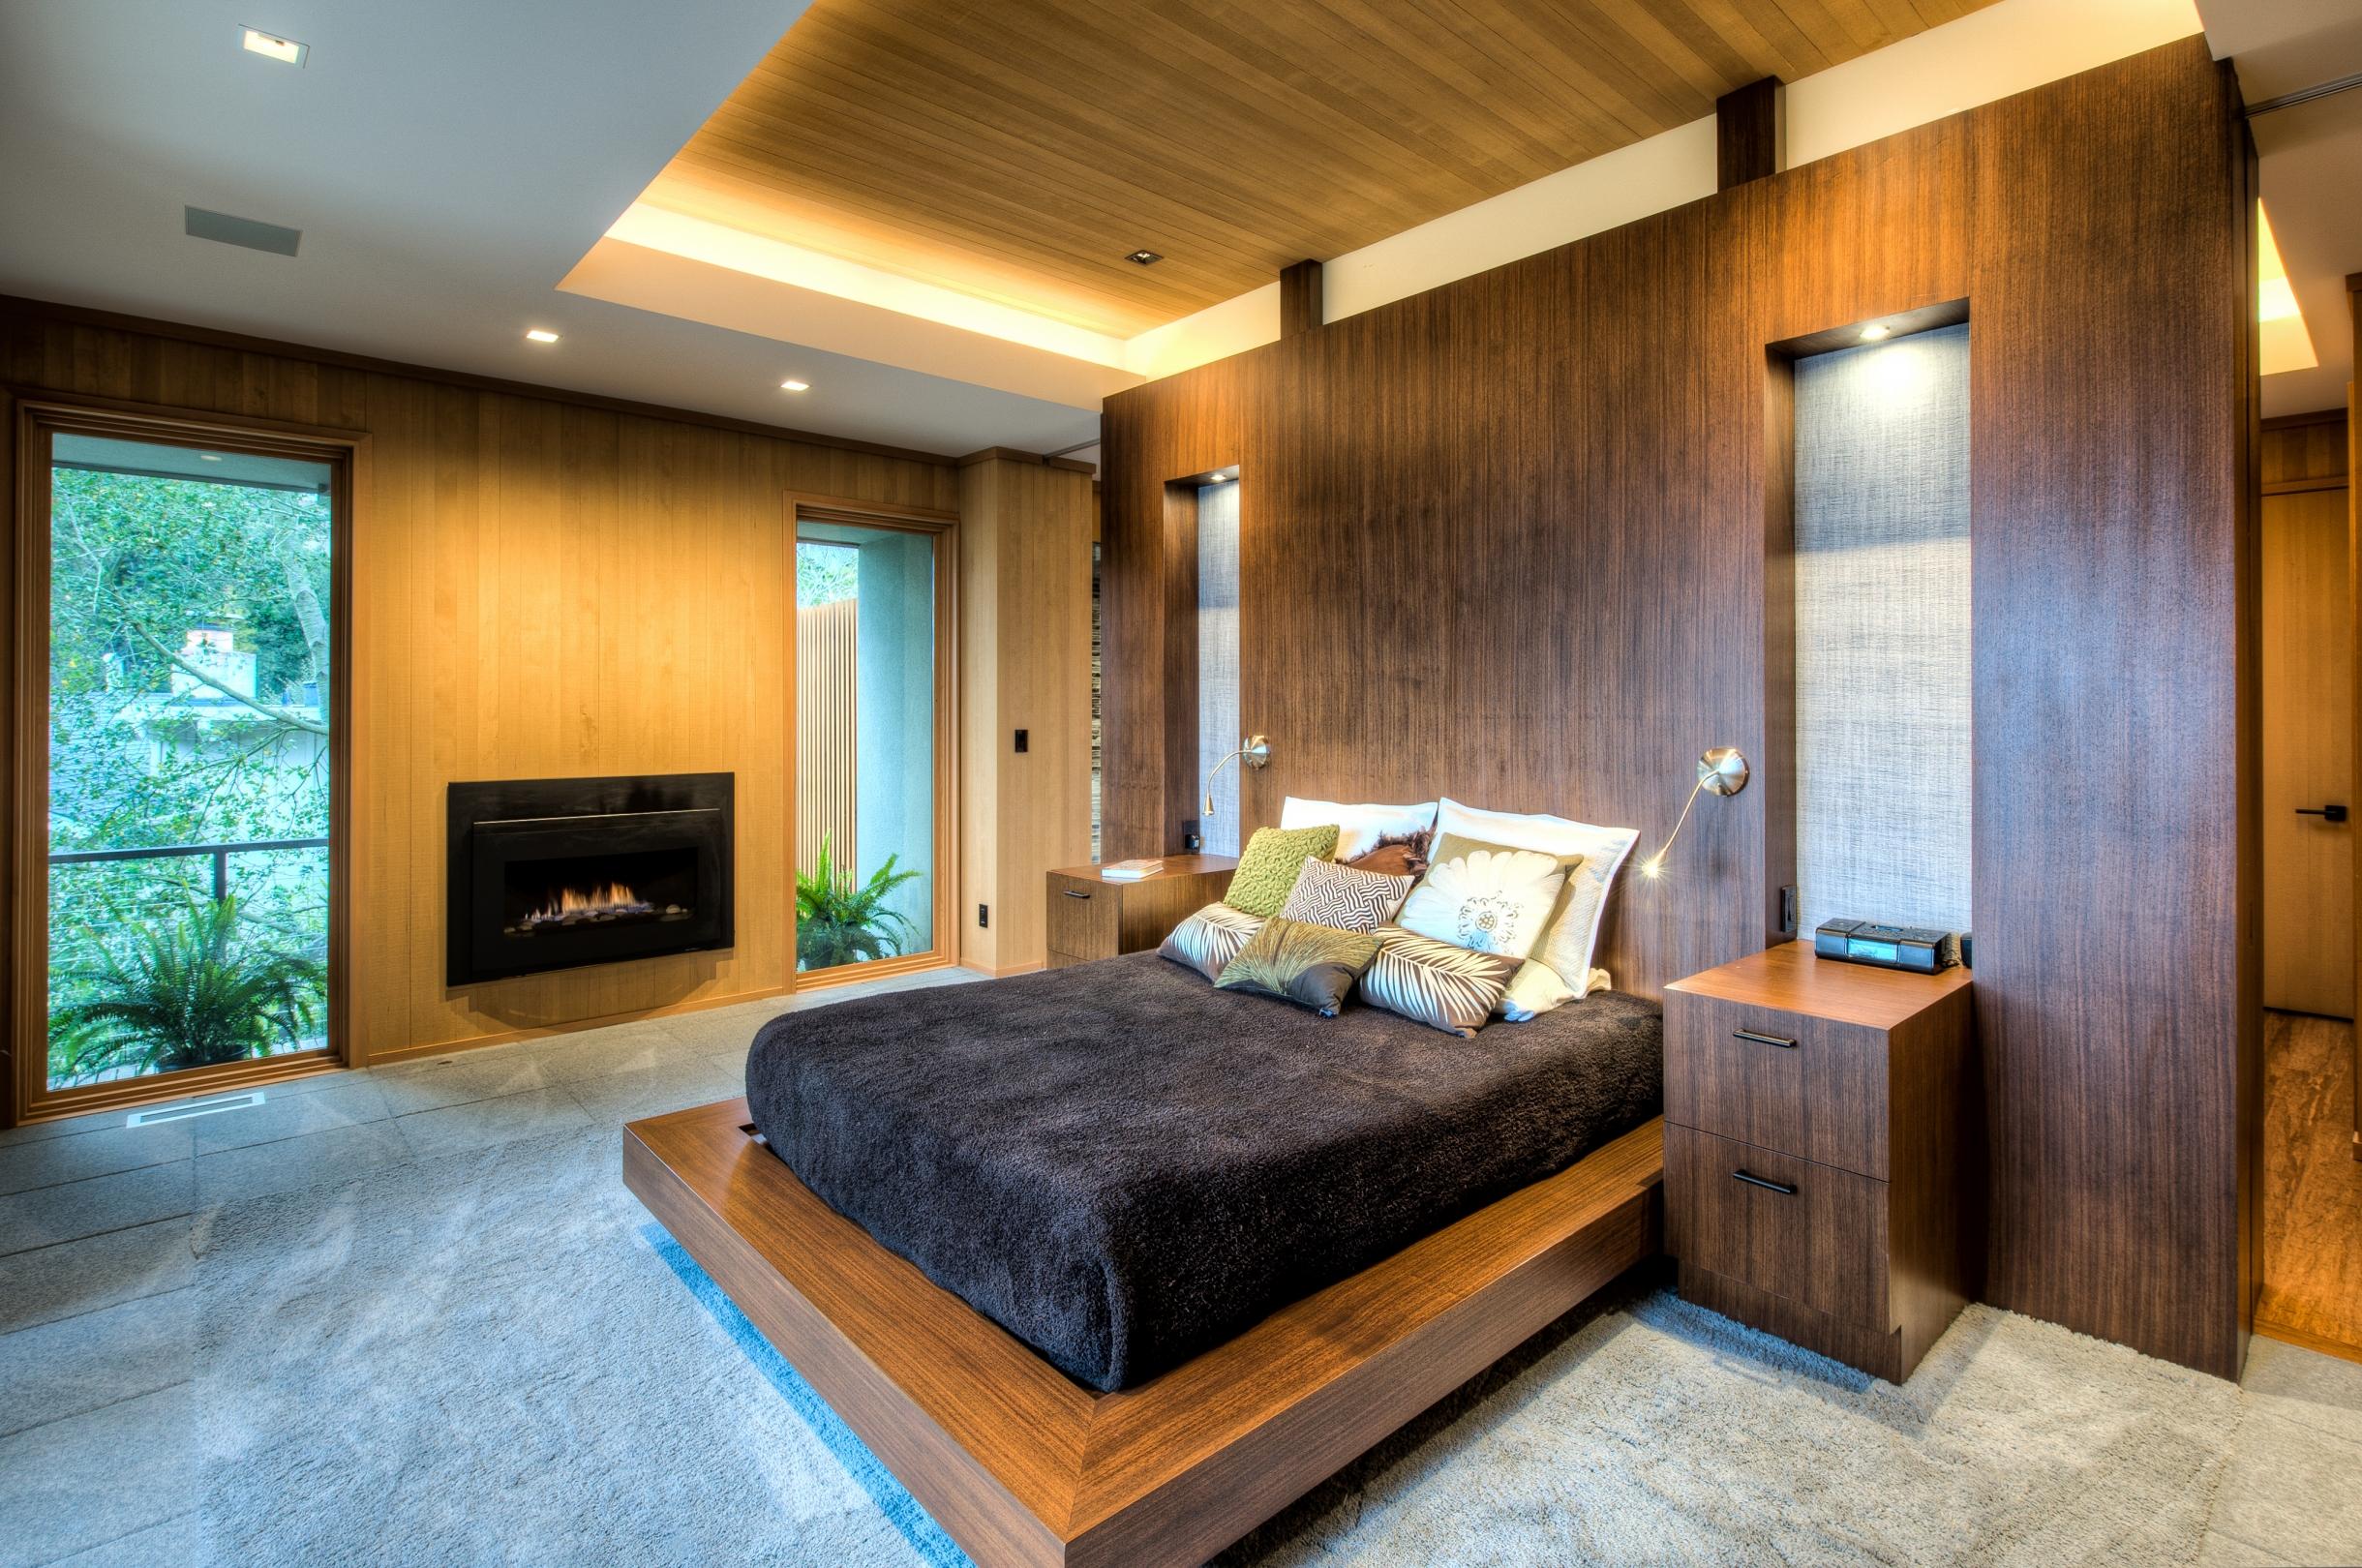 Leed Platinum Home Remodel Mccutcheon Construction